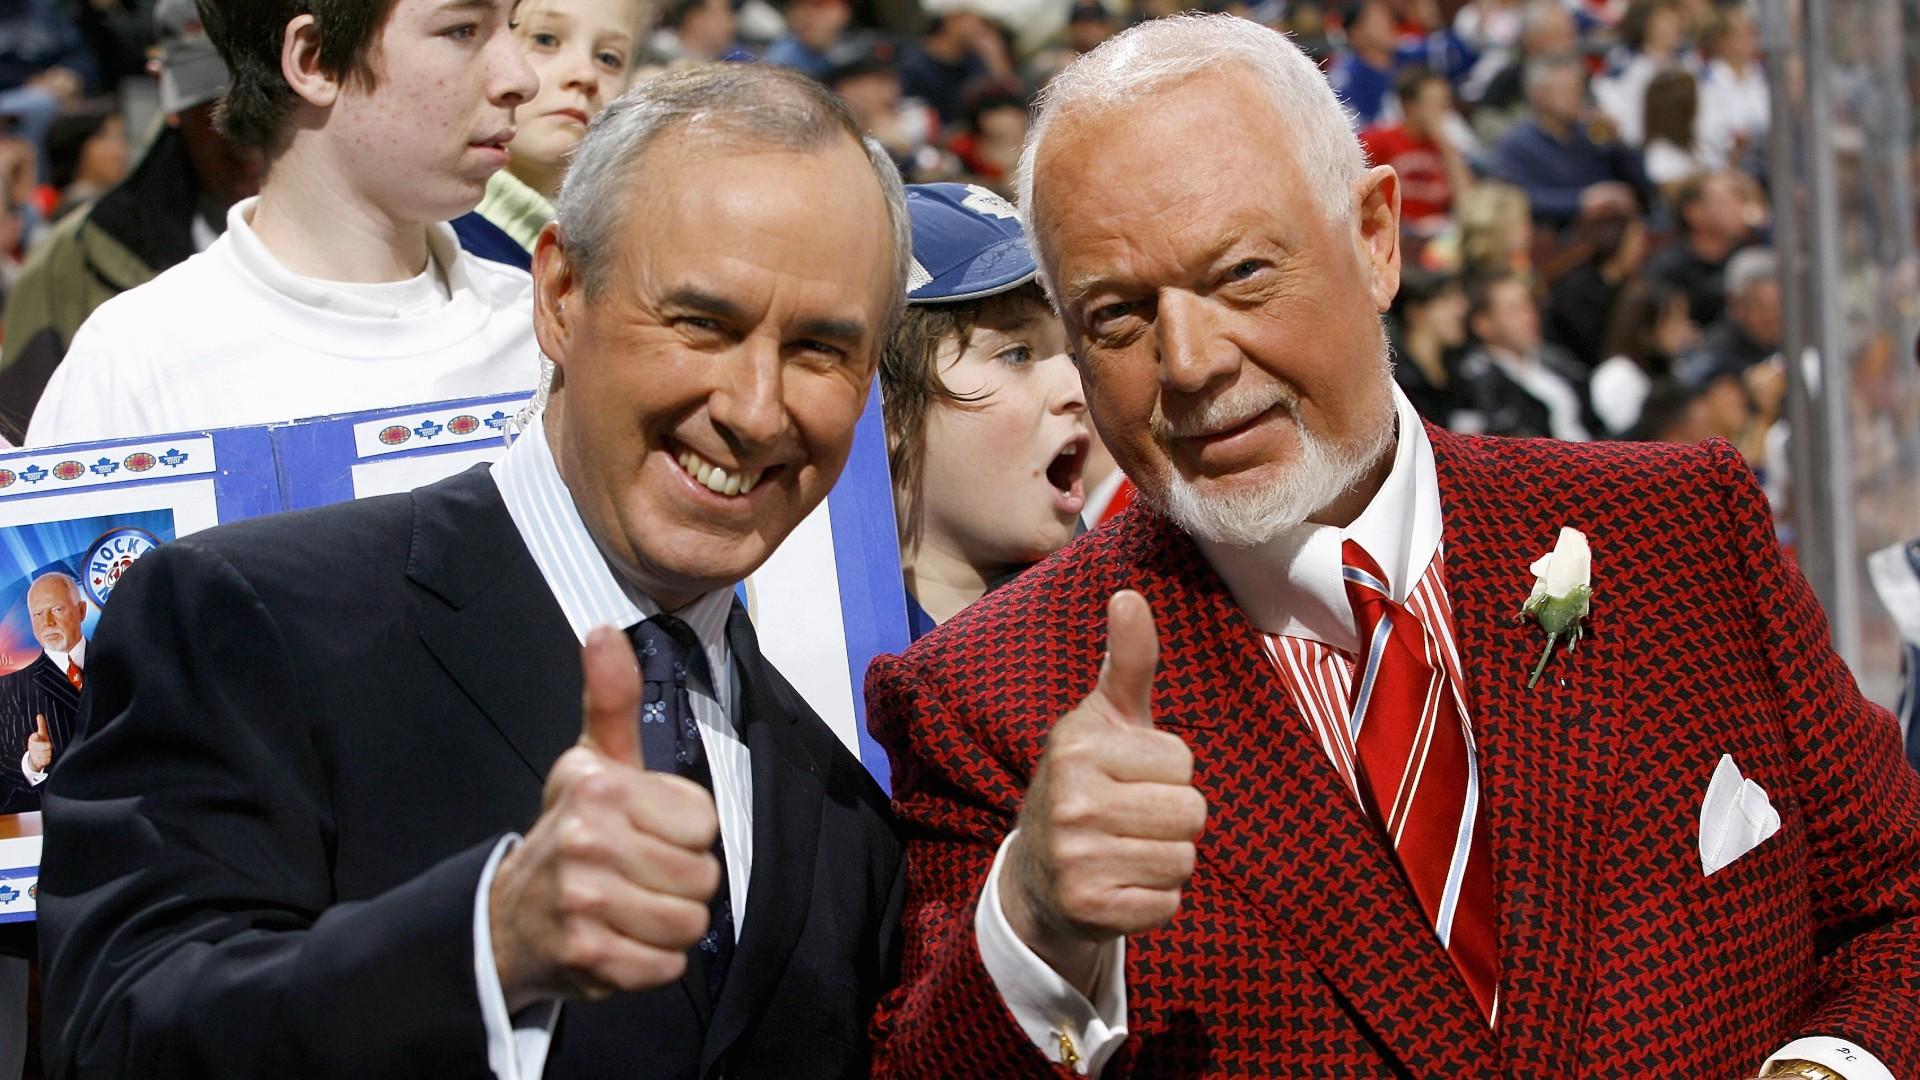 Ron MacLean addresses rumors of leaving 'Hockey Night in Canada'